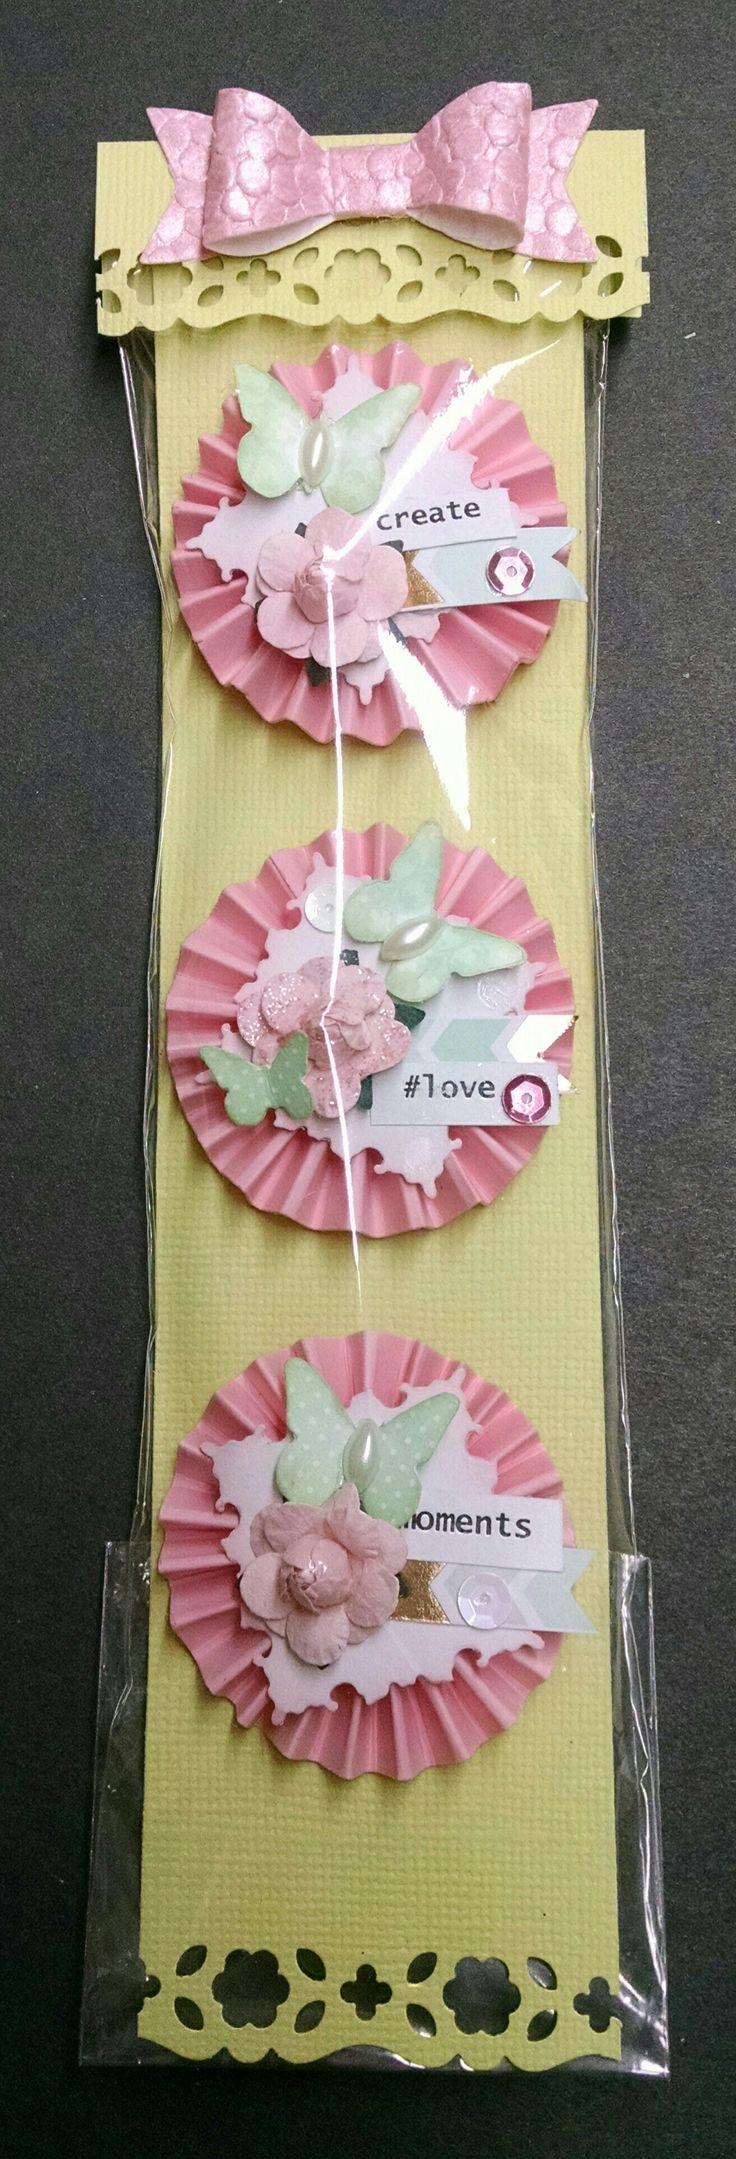 Homemade scrapbook ideas - Mini Rosette Embellishments Loaded Envelope Embellishmentscard Candy Embellishmentshandmade Embellishmentsscrapbook